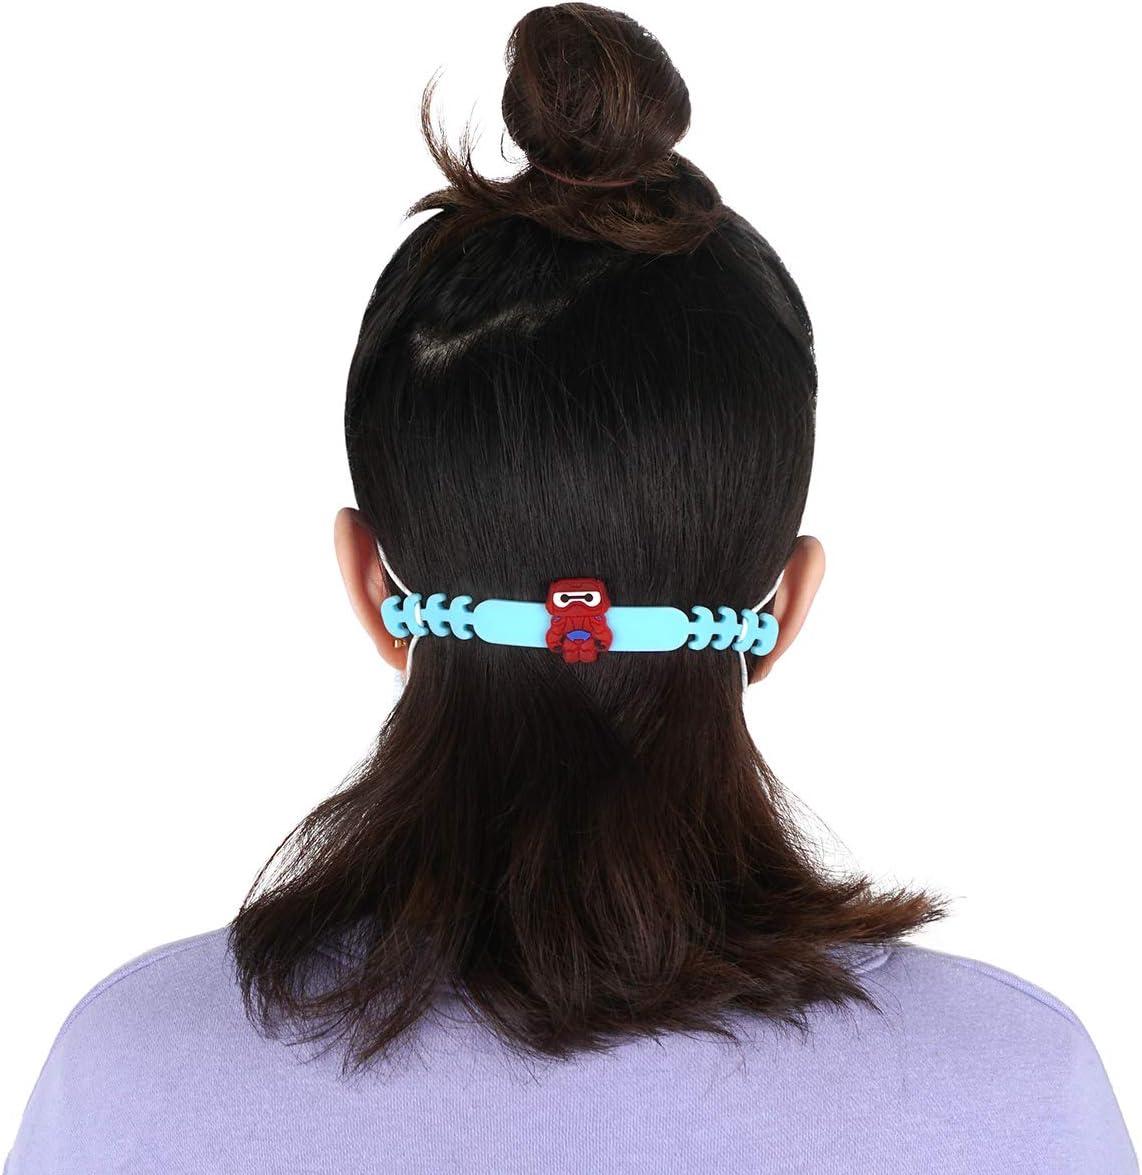 Protector de oreja para m/áscara de silicona I Alivio de los o/ídos para mascarilla de protecci/ón bucal I banda para ni/ños y mujeres I 6 unidades